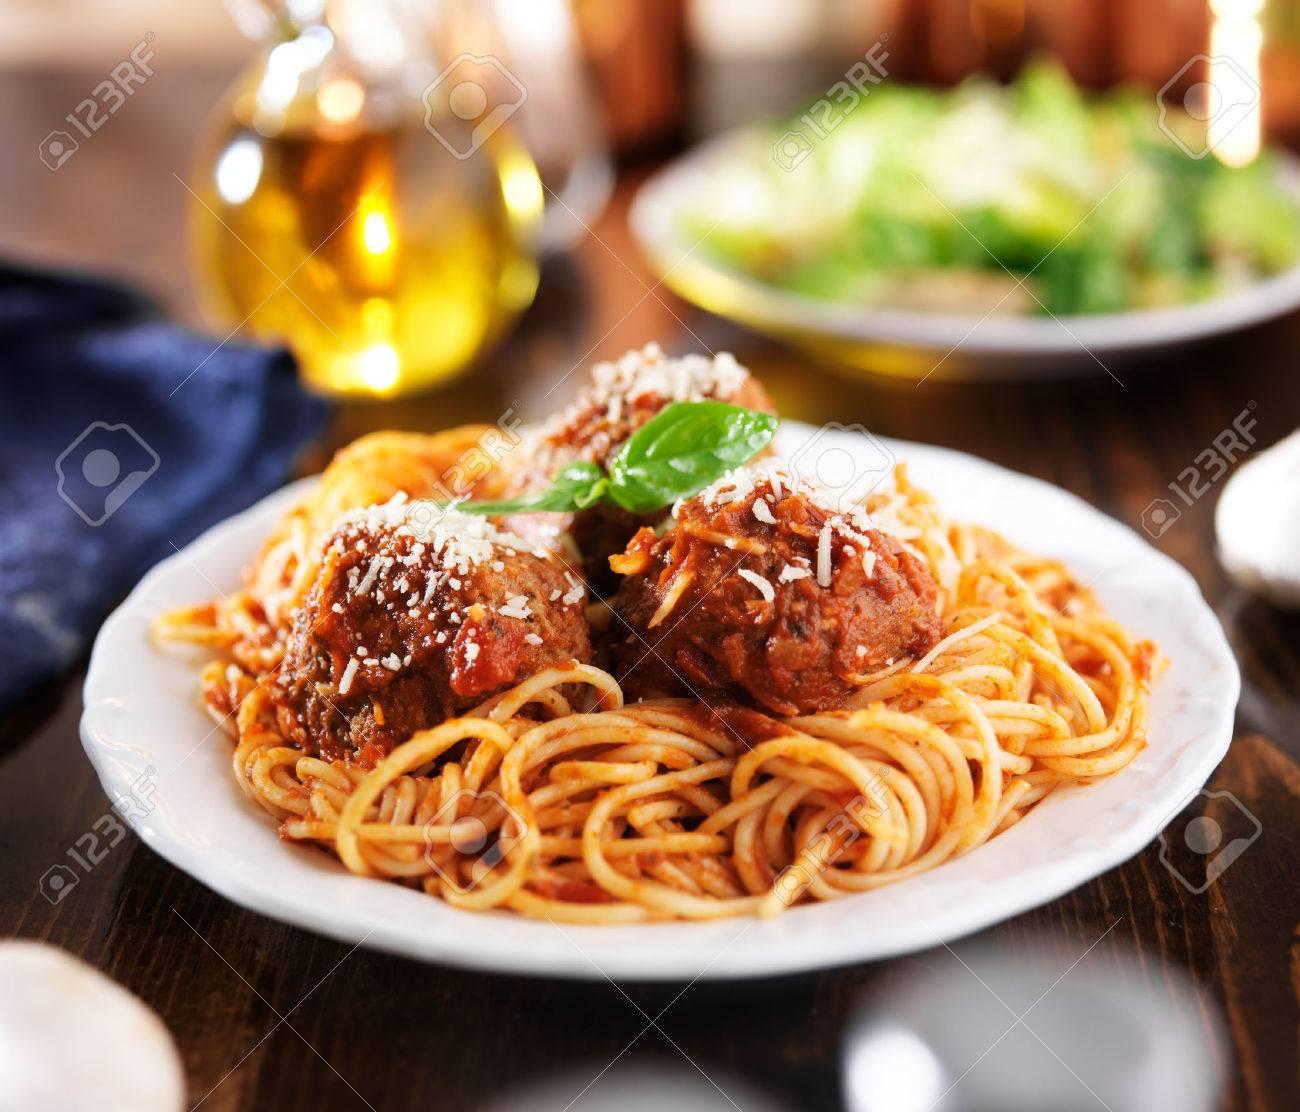 Dinner table with food - Spaghetti Dinner Italian Food Spaghetti And Meatballs At Dinner Table